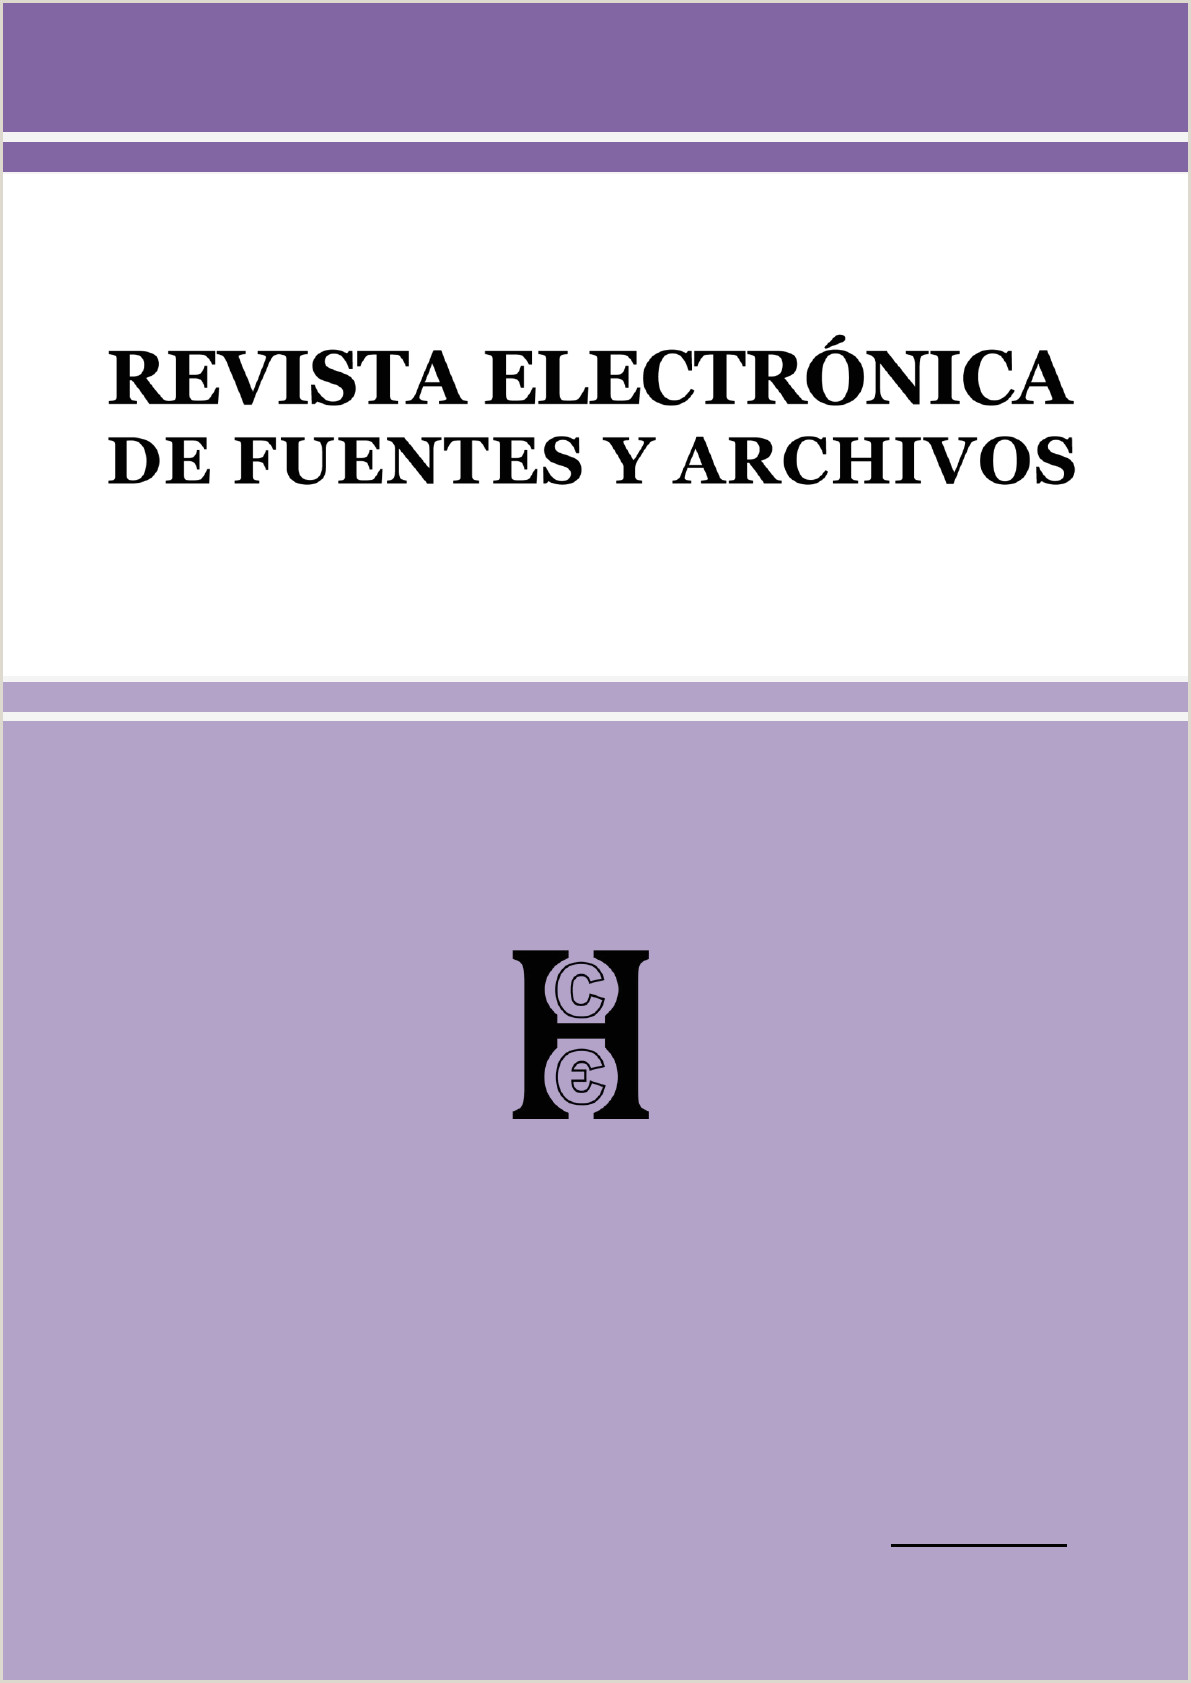 Llenar Hoja De Vida Minerva 1003 Por Internet File Ediciones Libre [pdf Document]